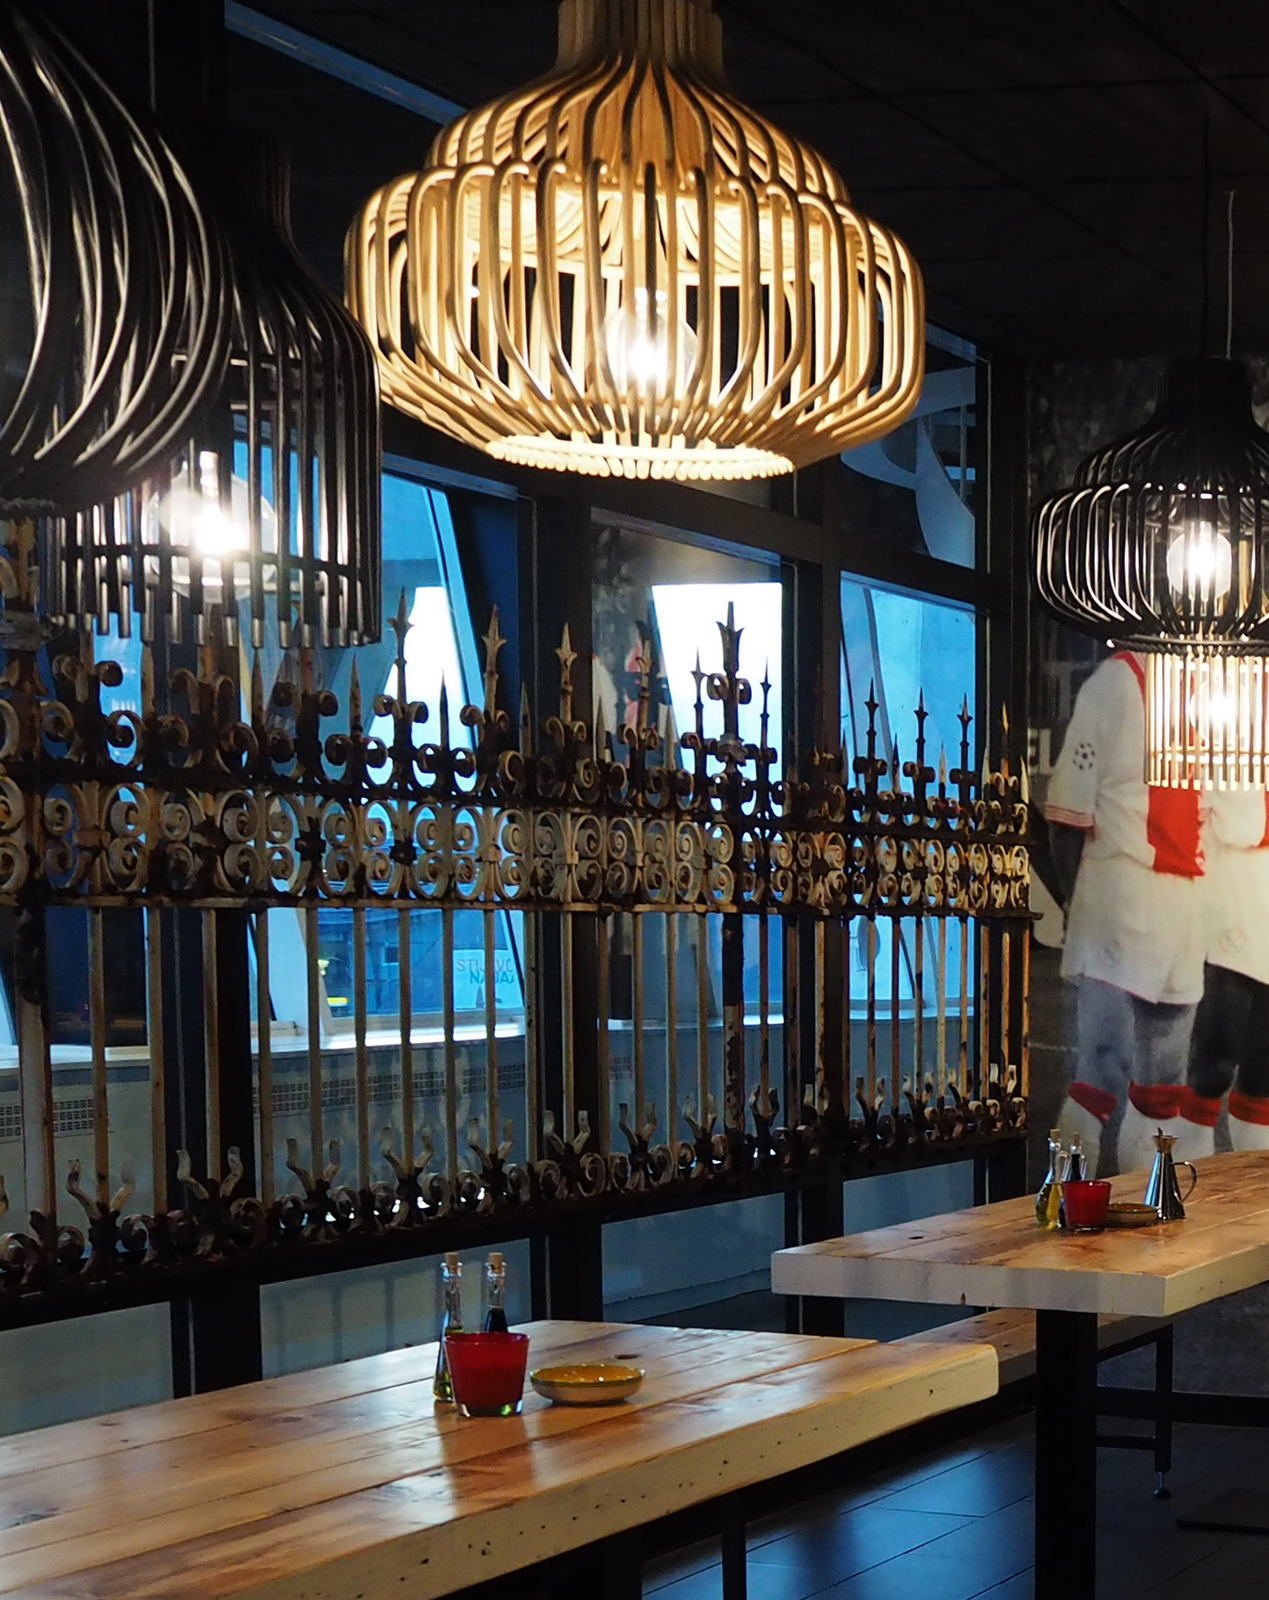 Skybox Ajax Amsterdam Arena Rome 96 restaurant, Vincent Sheppard, Jeroen de Nijs